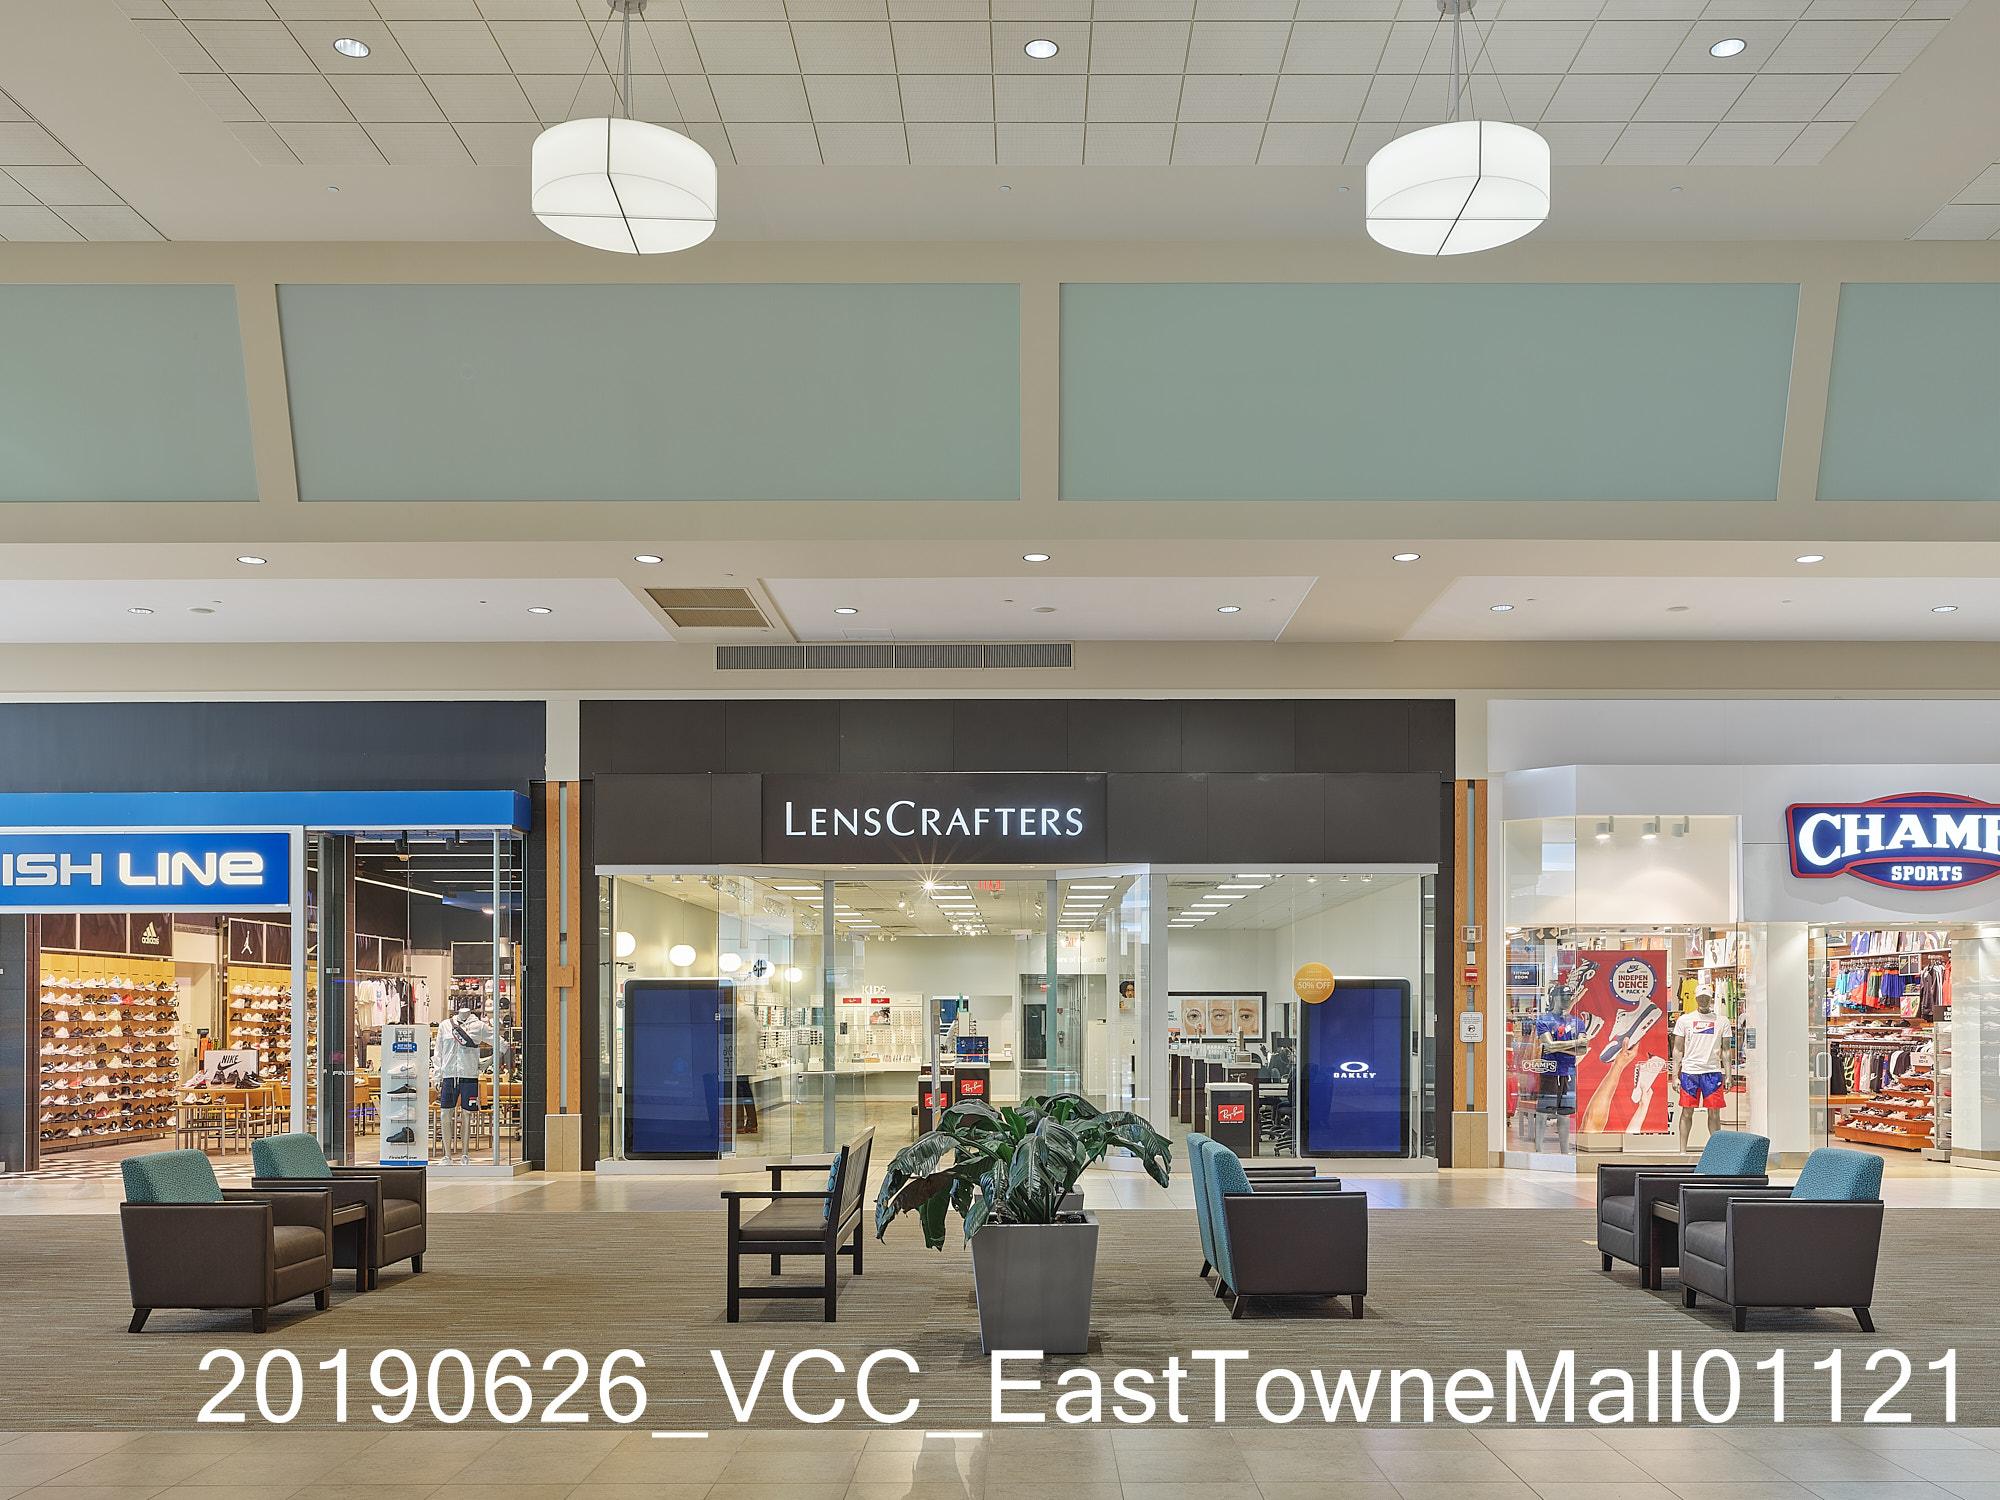 20190626_VCC_EastTowneMall01121.jpg